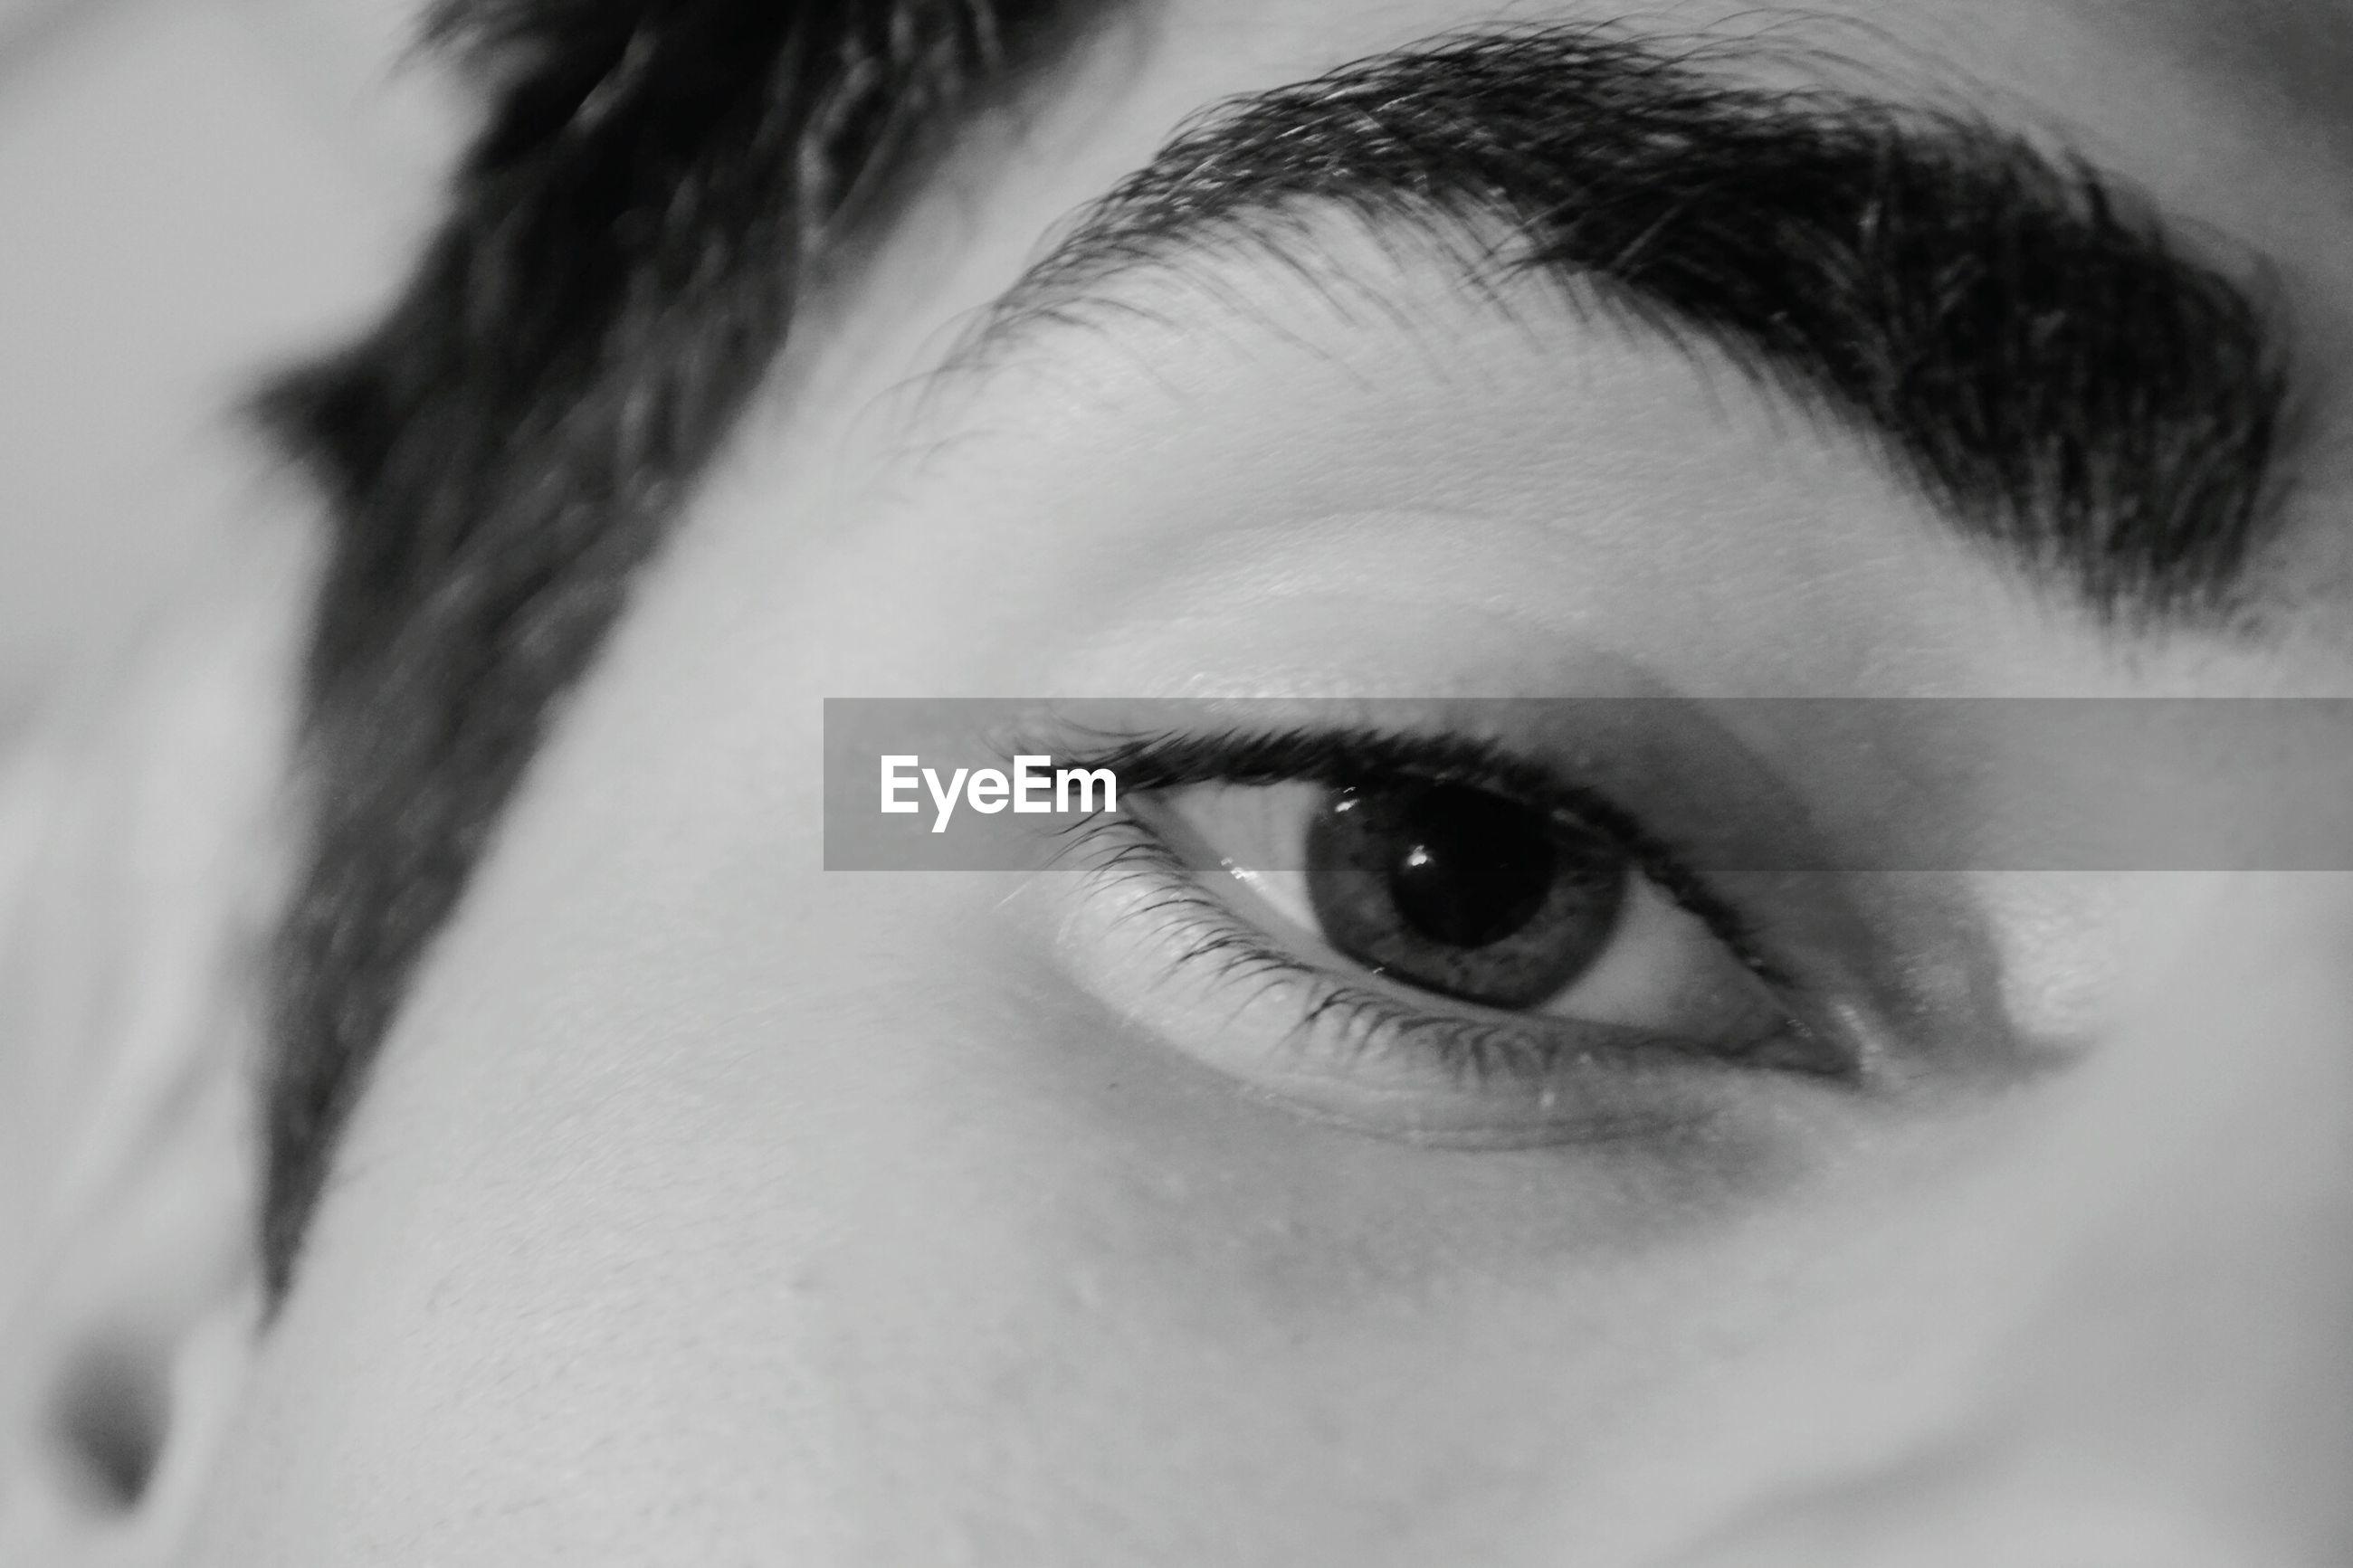 human eye, close-up, human body part, real people, looking at camera, eyelash, one person, portrait, eyesight, human skin, eyeball, eyebrow, sensory perception, women, indoors, day, young adult, adult, people